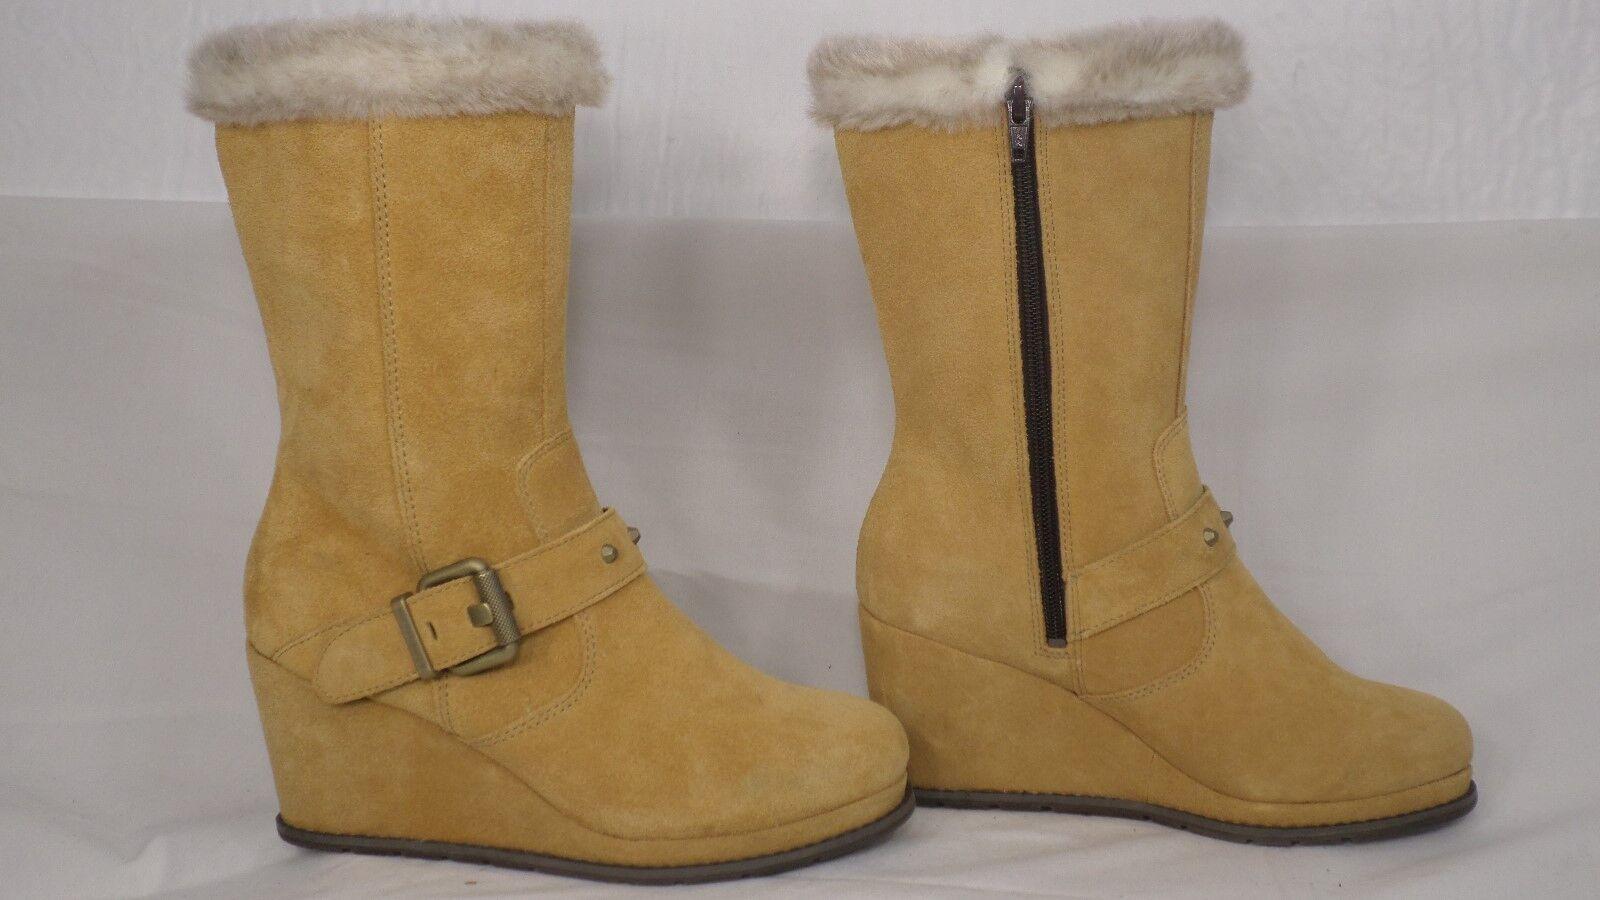 CAT Footwear 'Sway' Tan Suede Mid-Calf Wedge Winter Boot Women Size 7 M